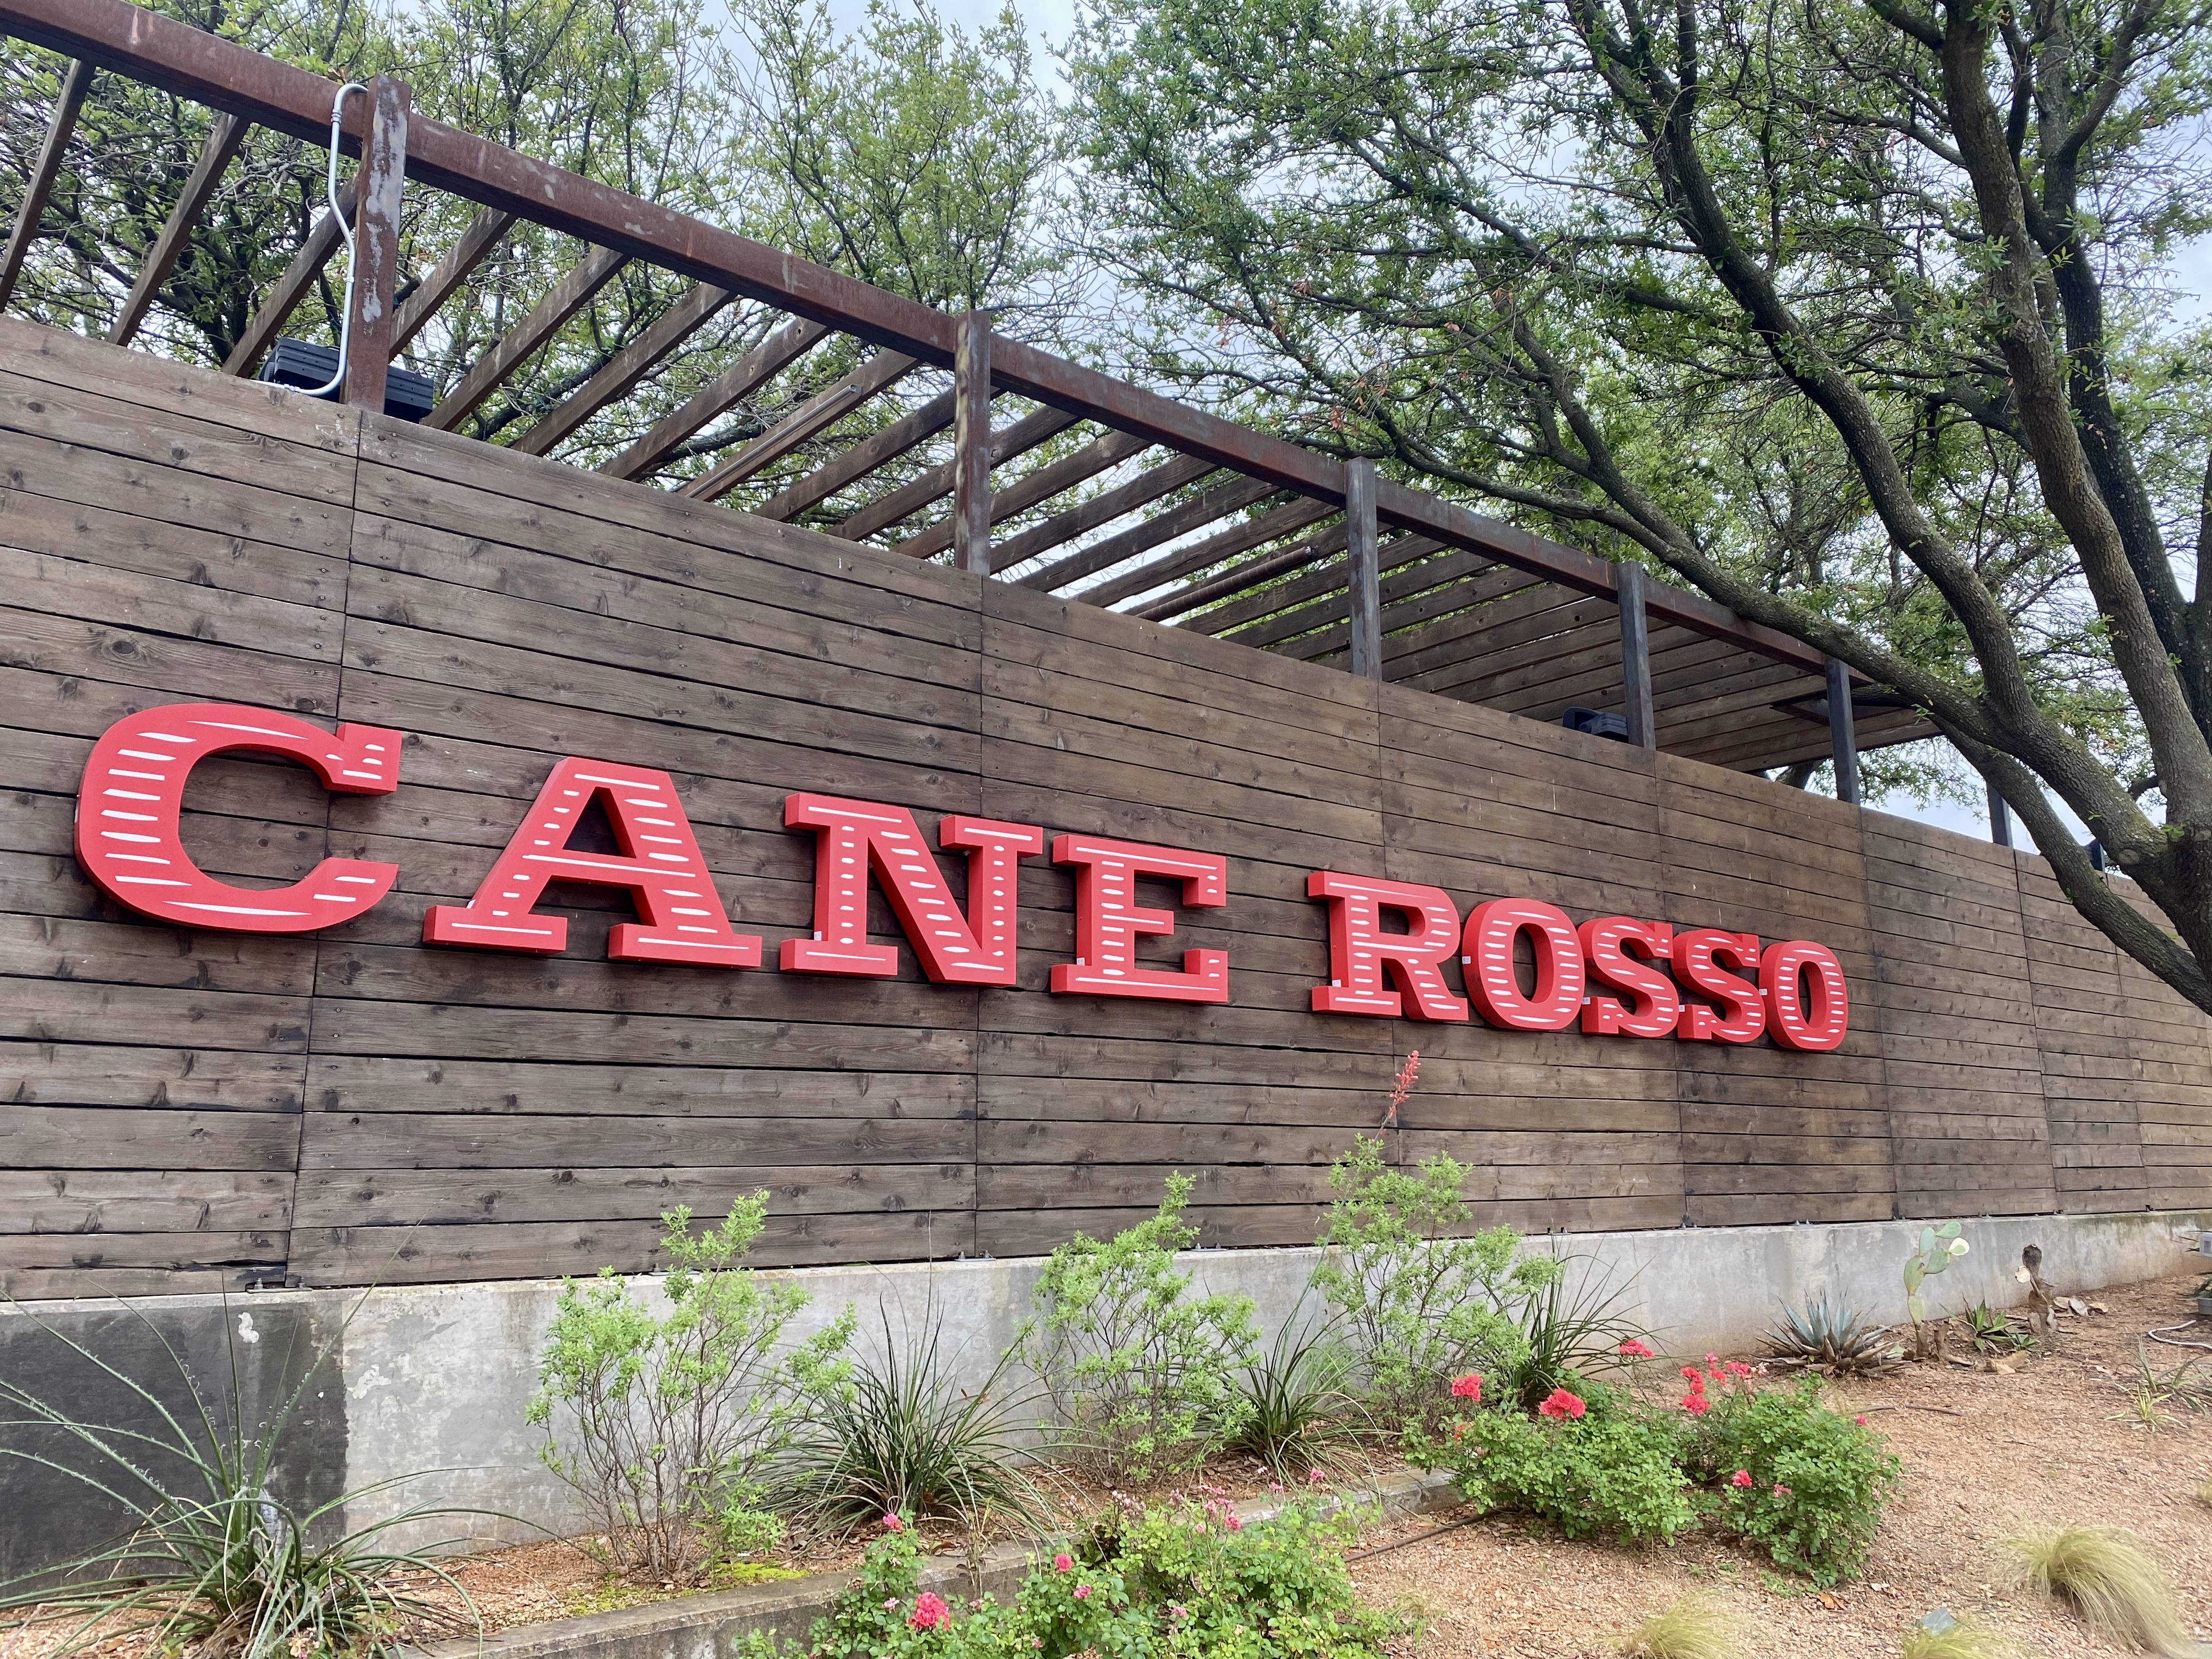 Cane Rosso Restaurant in White Rock Lake